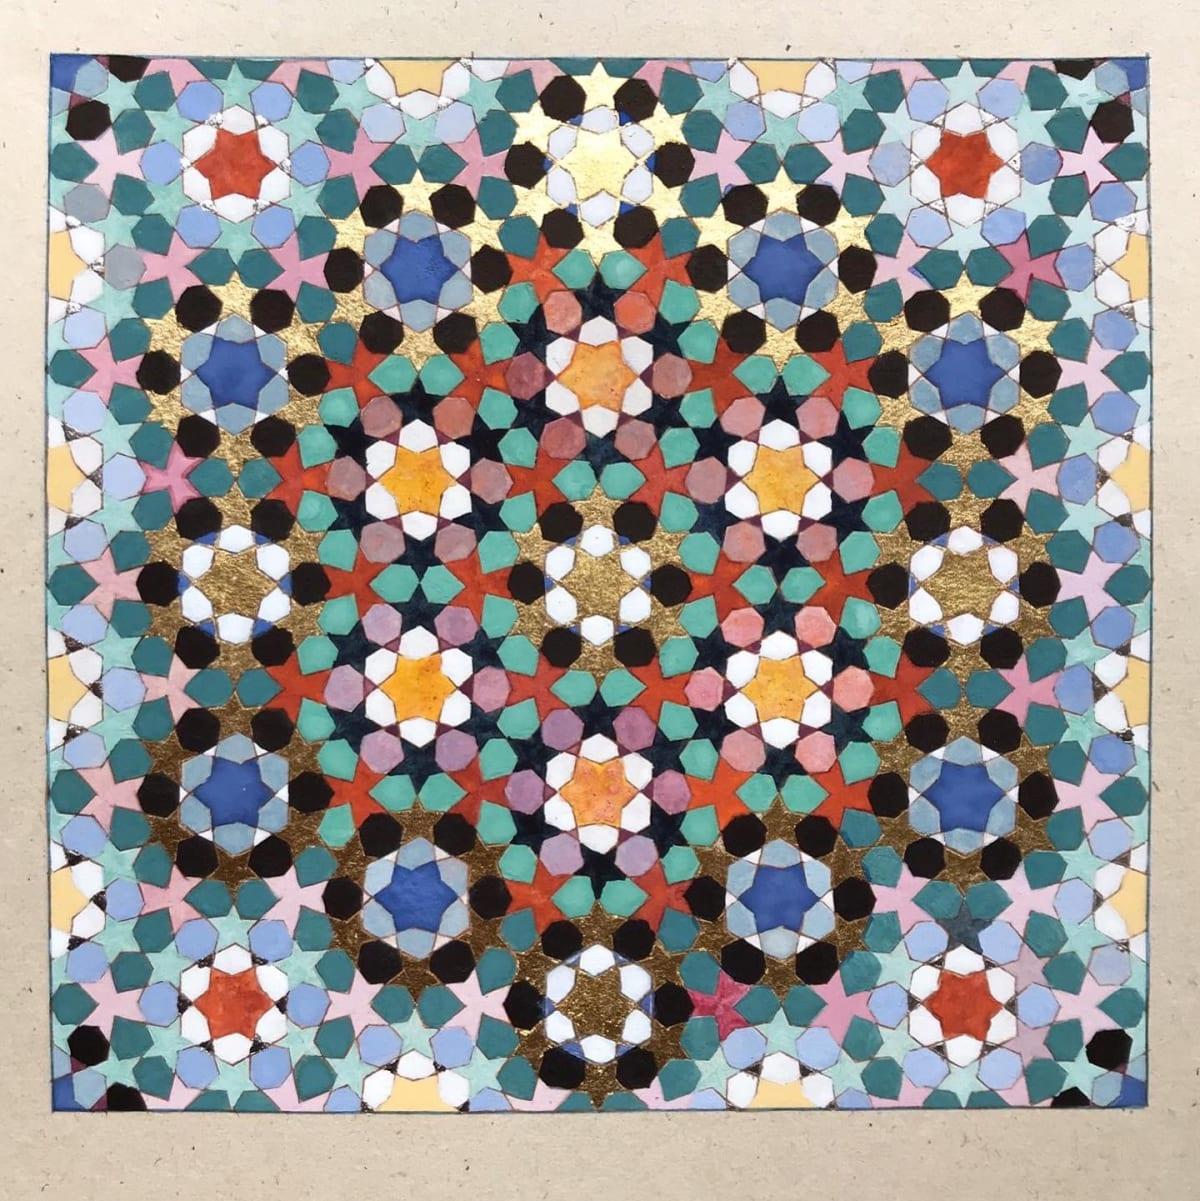 Elisabeth Deane All Gifts, 2020 Italian gold leaf, palladium leaf, natural pigments and Arabic gum on handmade Indian hemp paper 16.8 x 17.4 cm 6 5/8 x 6 7/8 in